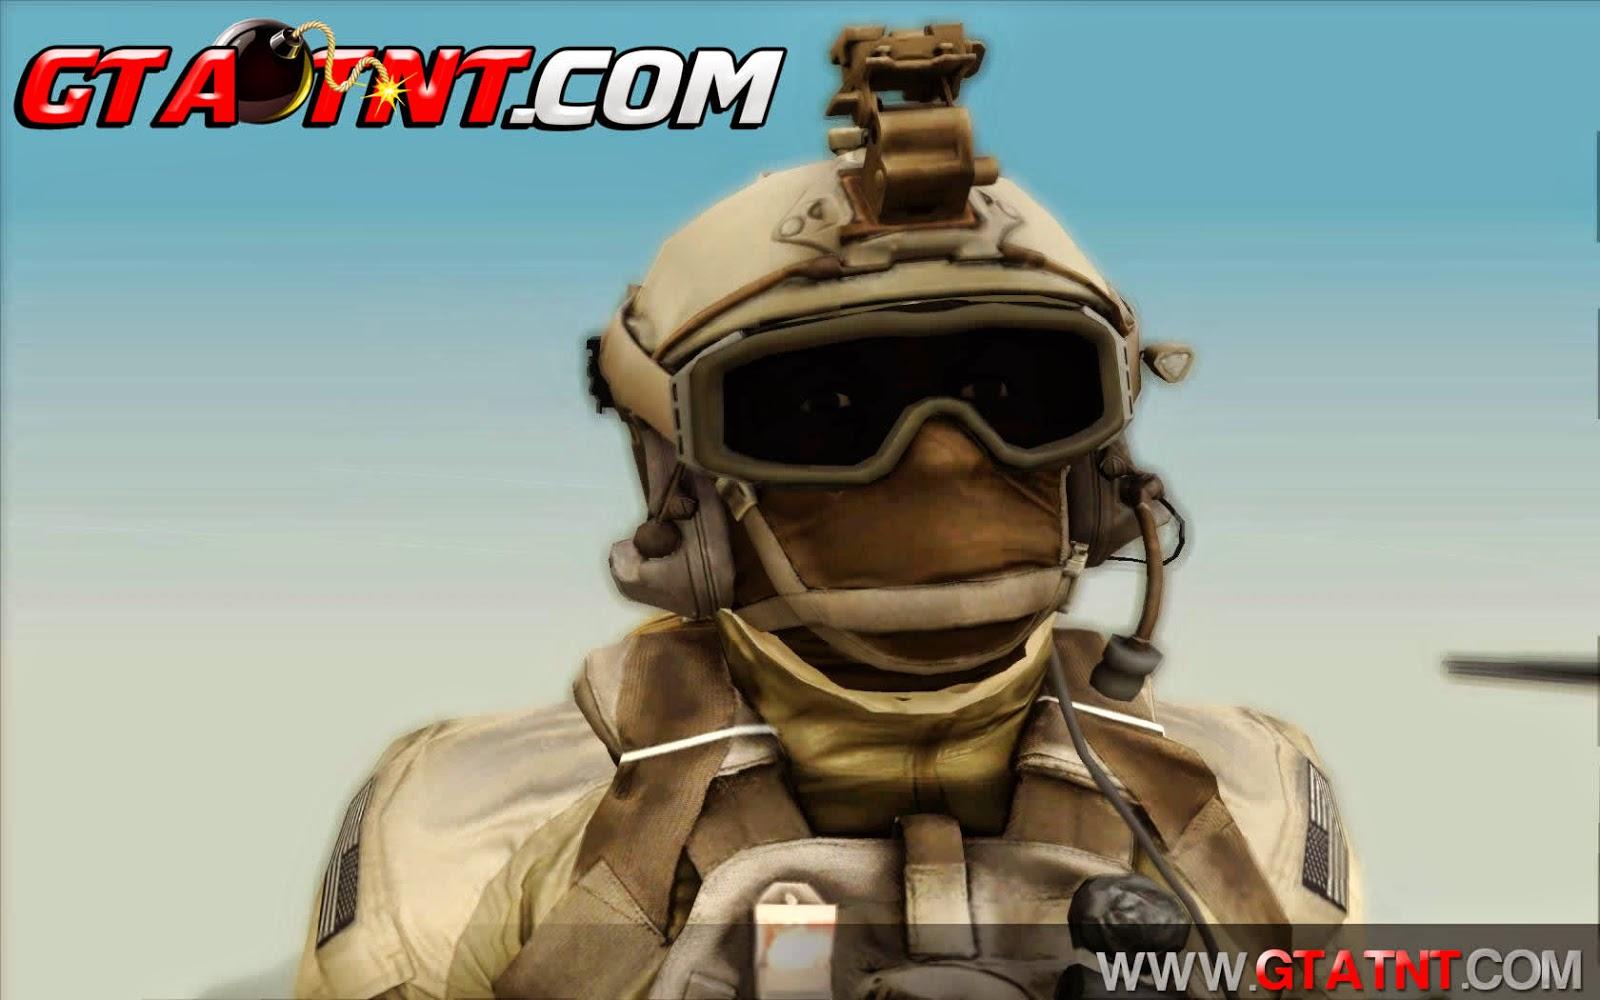 Pack de skins convertidas do Battlefield 4 para GTA San Andreas